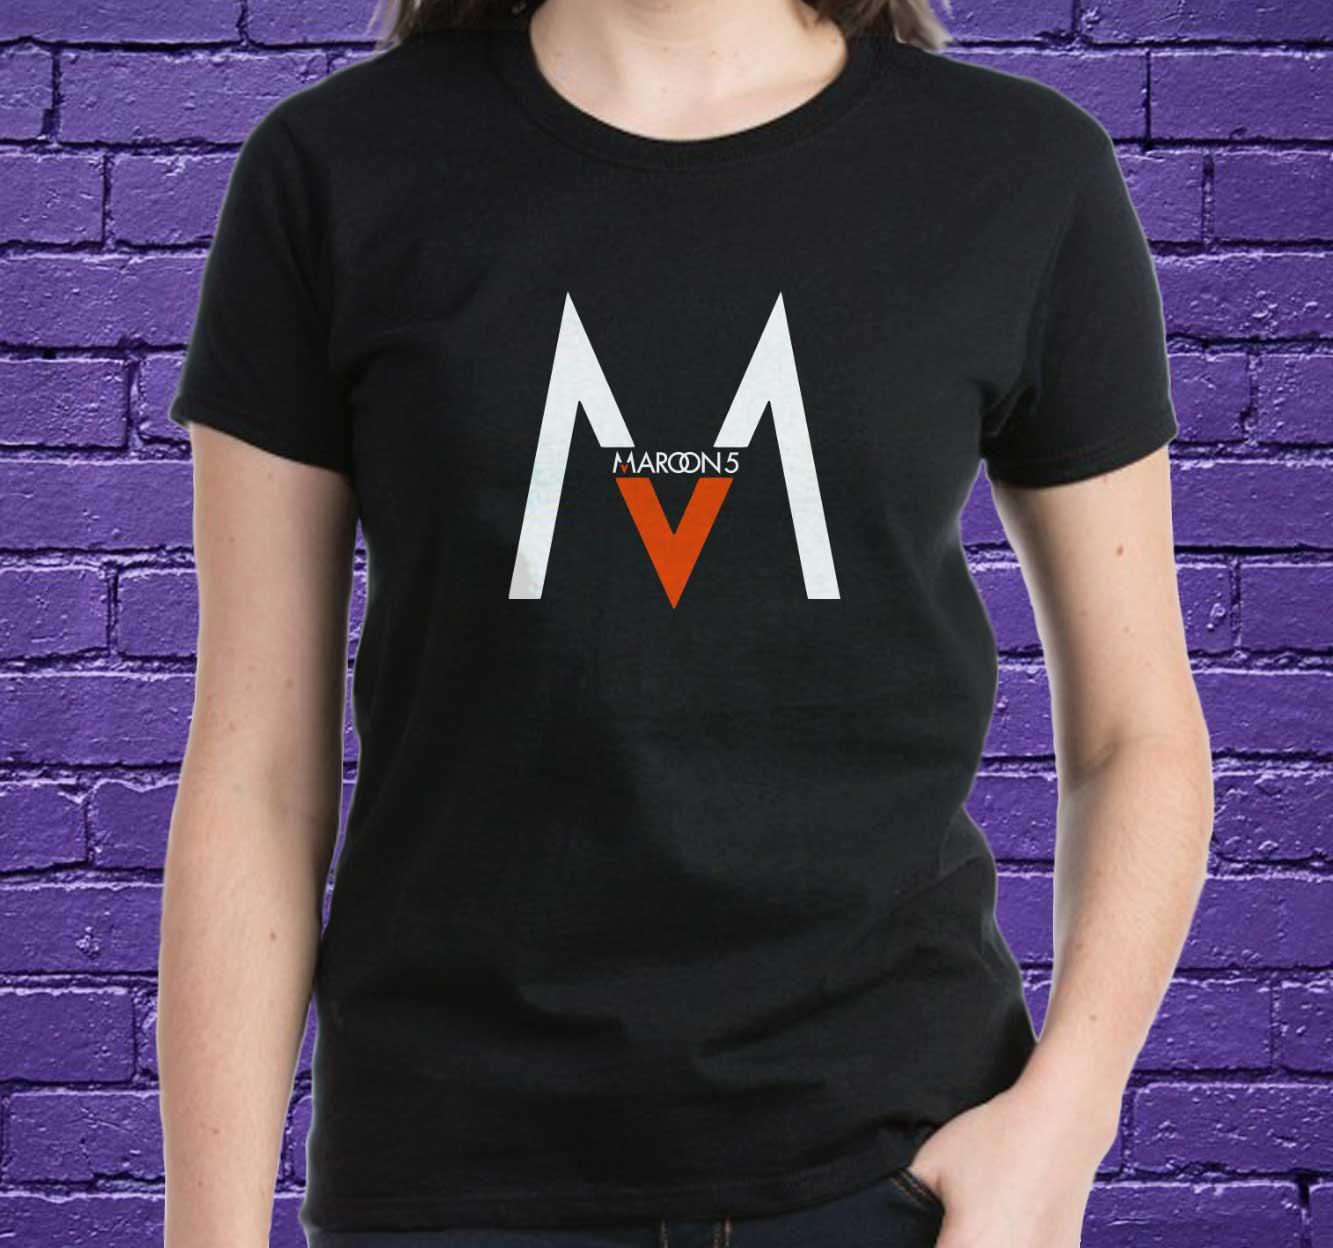 Shirt design pinterest - Maroon 5 Shirt Black White Maroon 5 Women Tshirt Best Design Maroon 5 Animals Shirt Tumblr Pinterest Mf01ocf